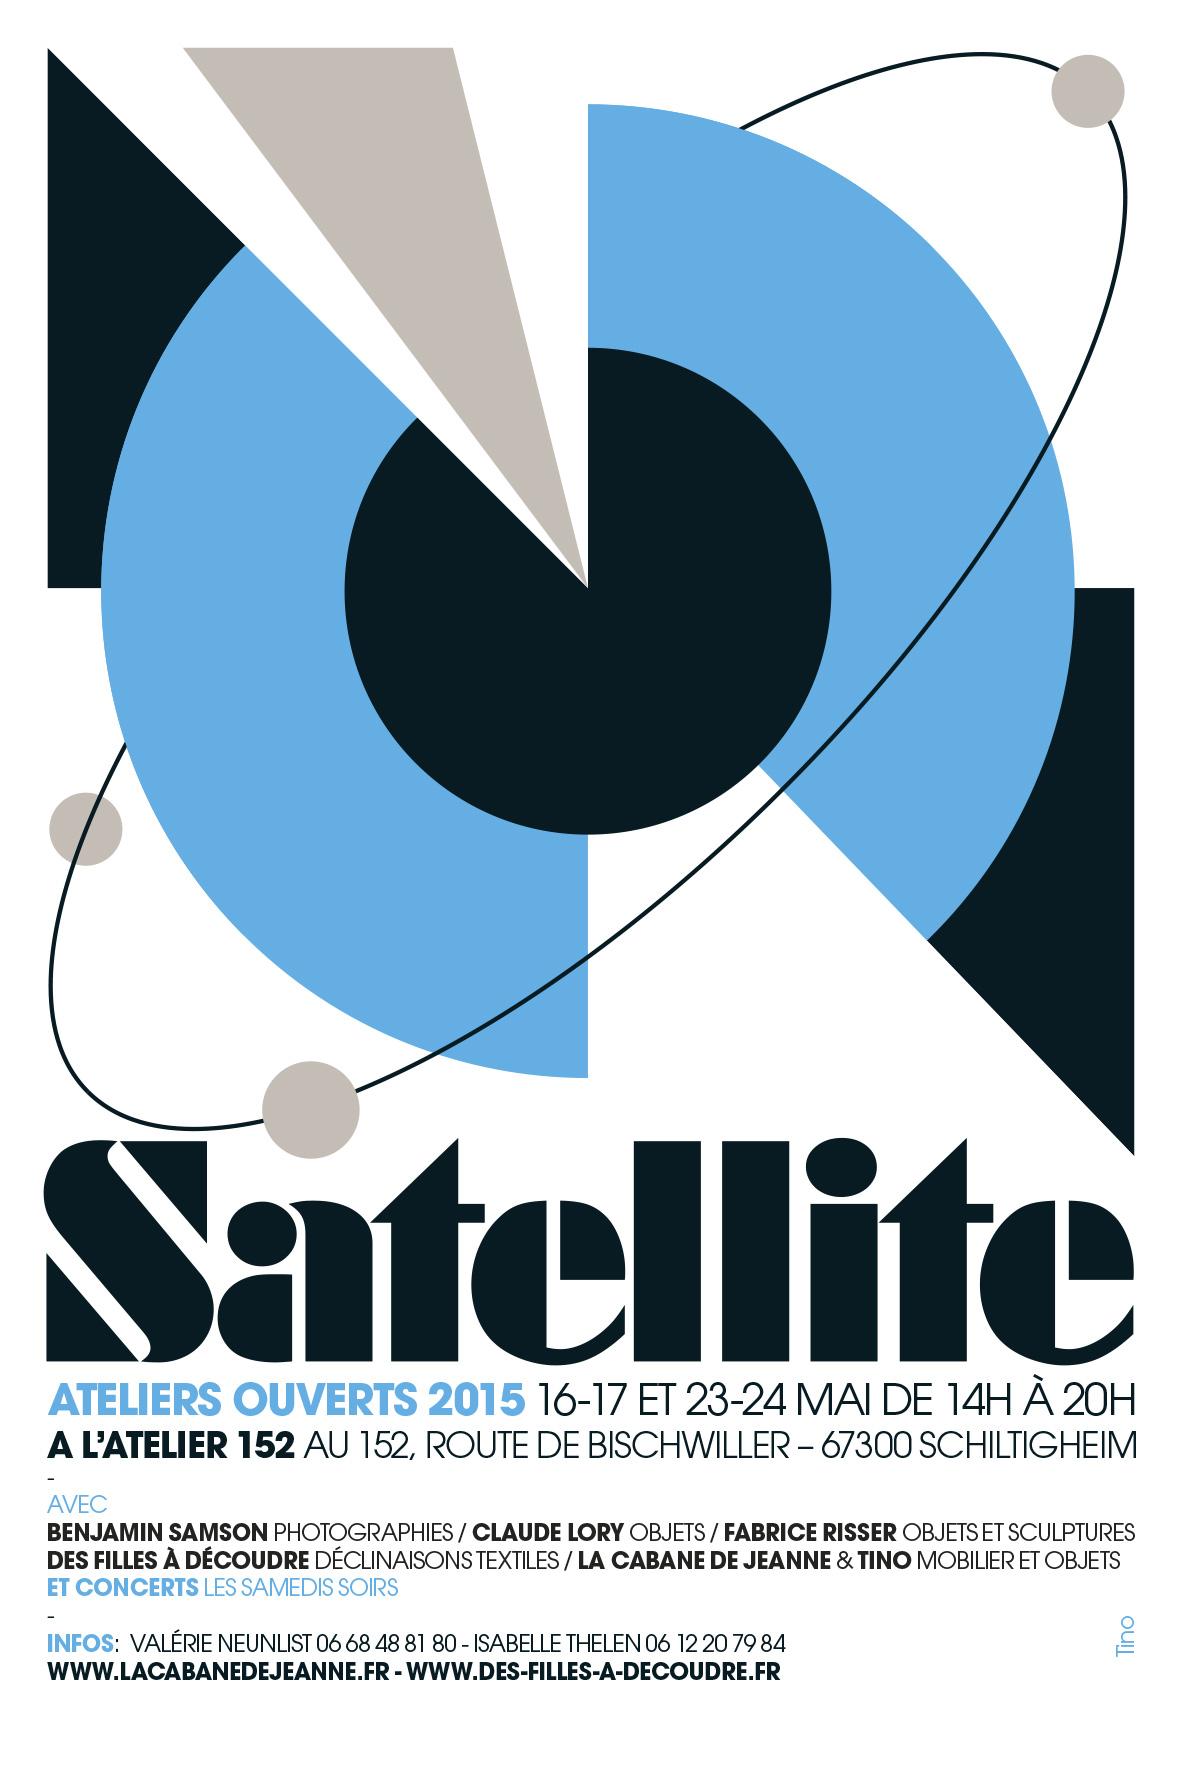 tino-tinoland-affiche-satellite